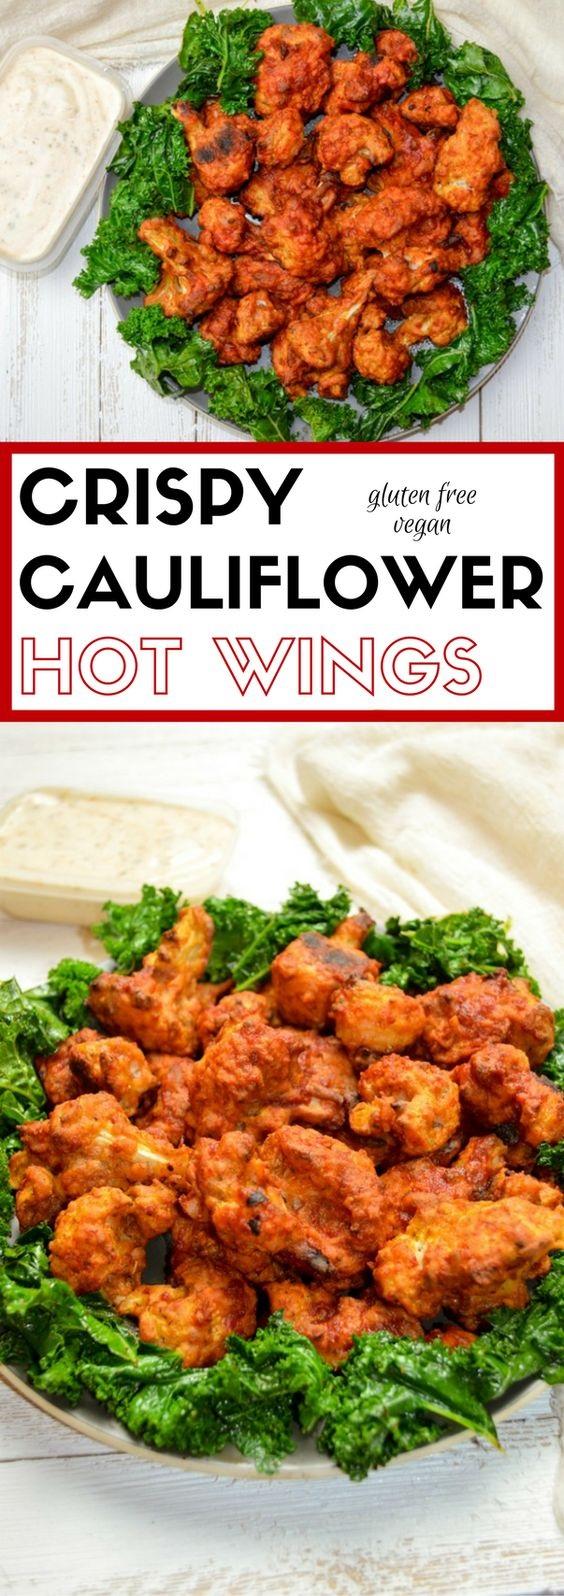 Crispy Cauliflower Hot Wings